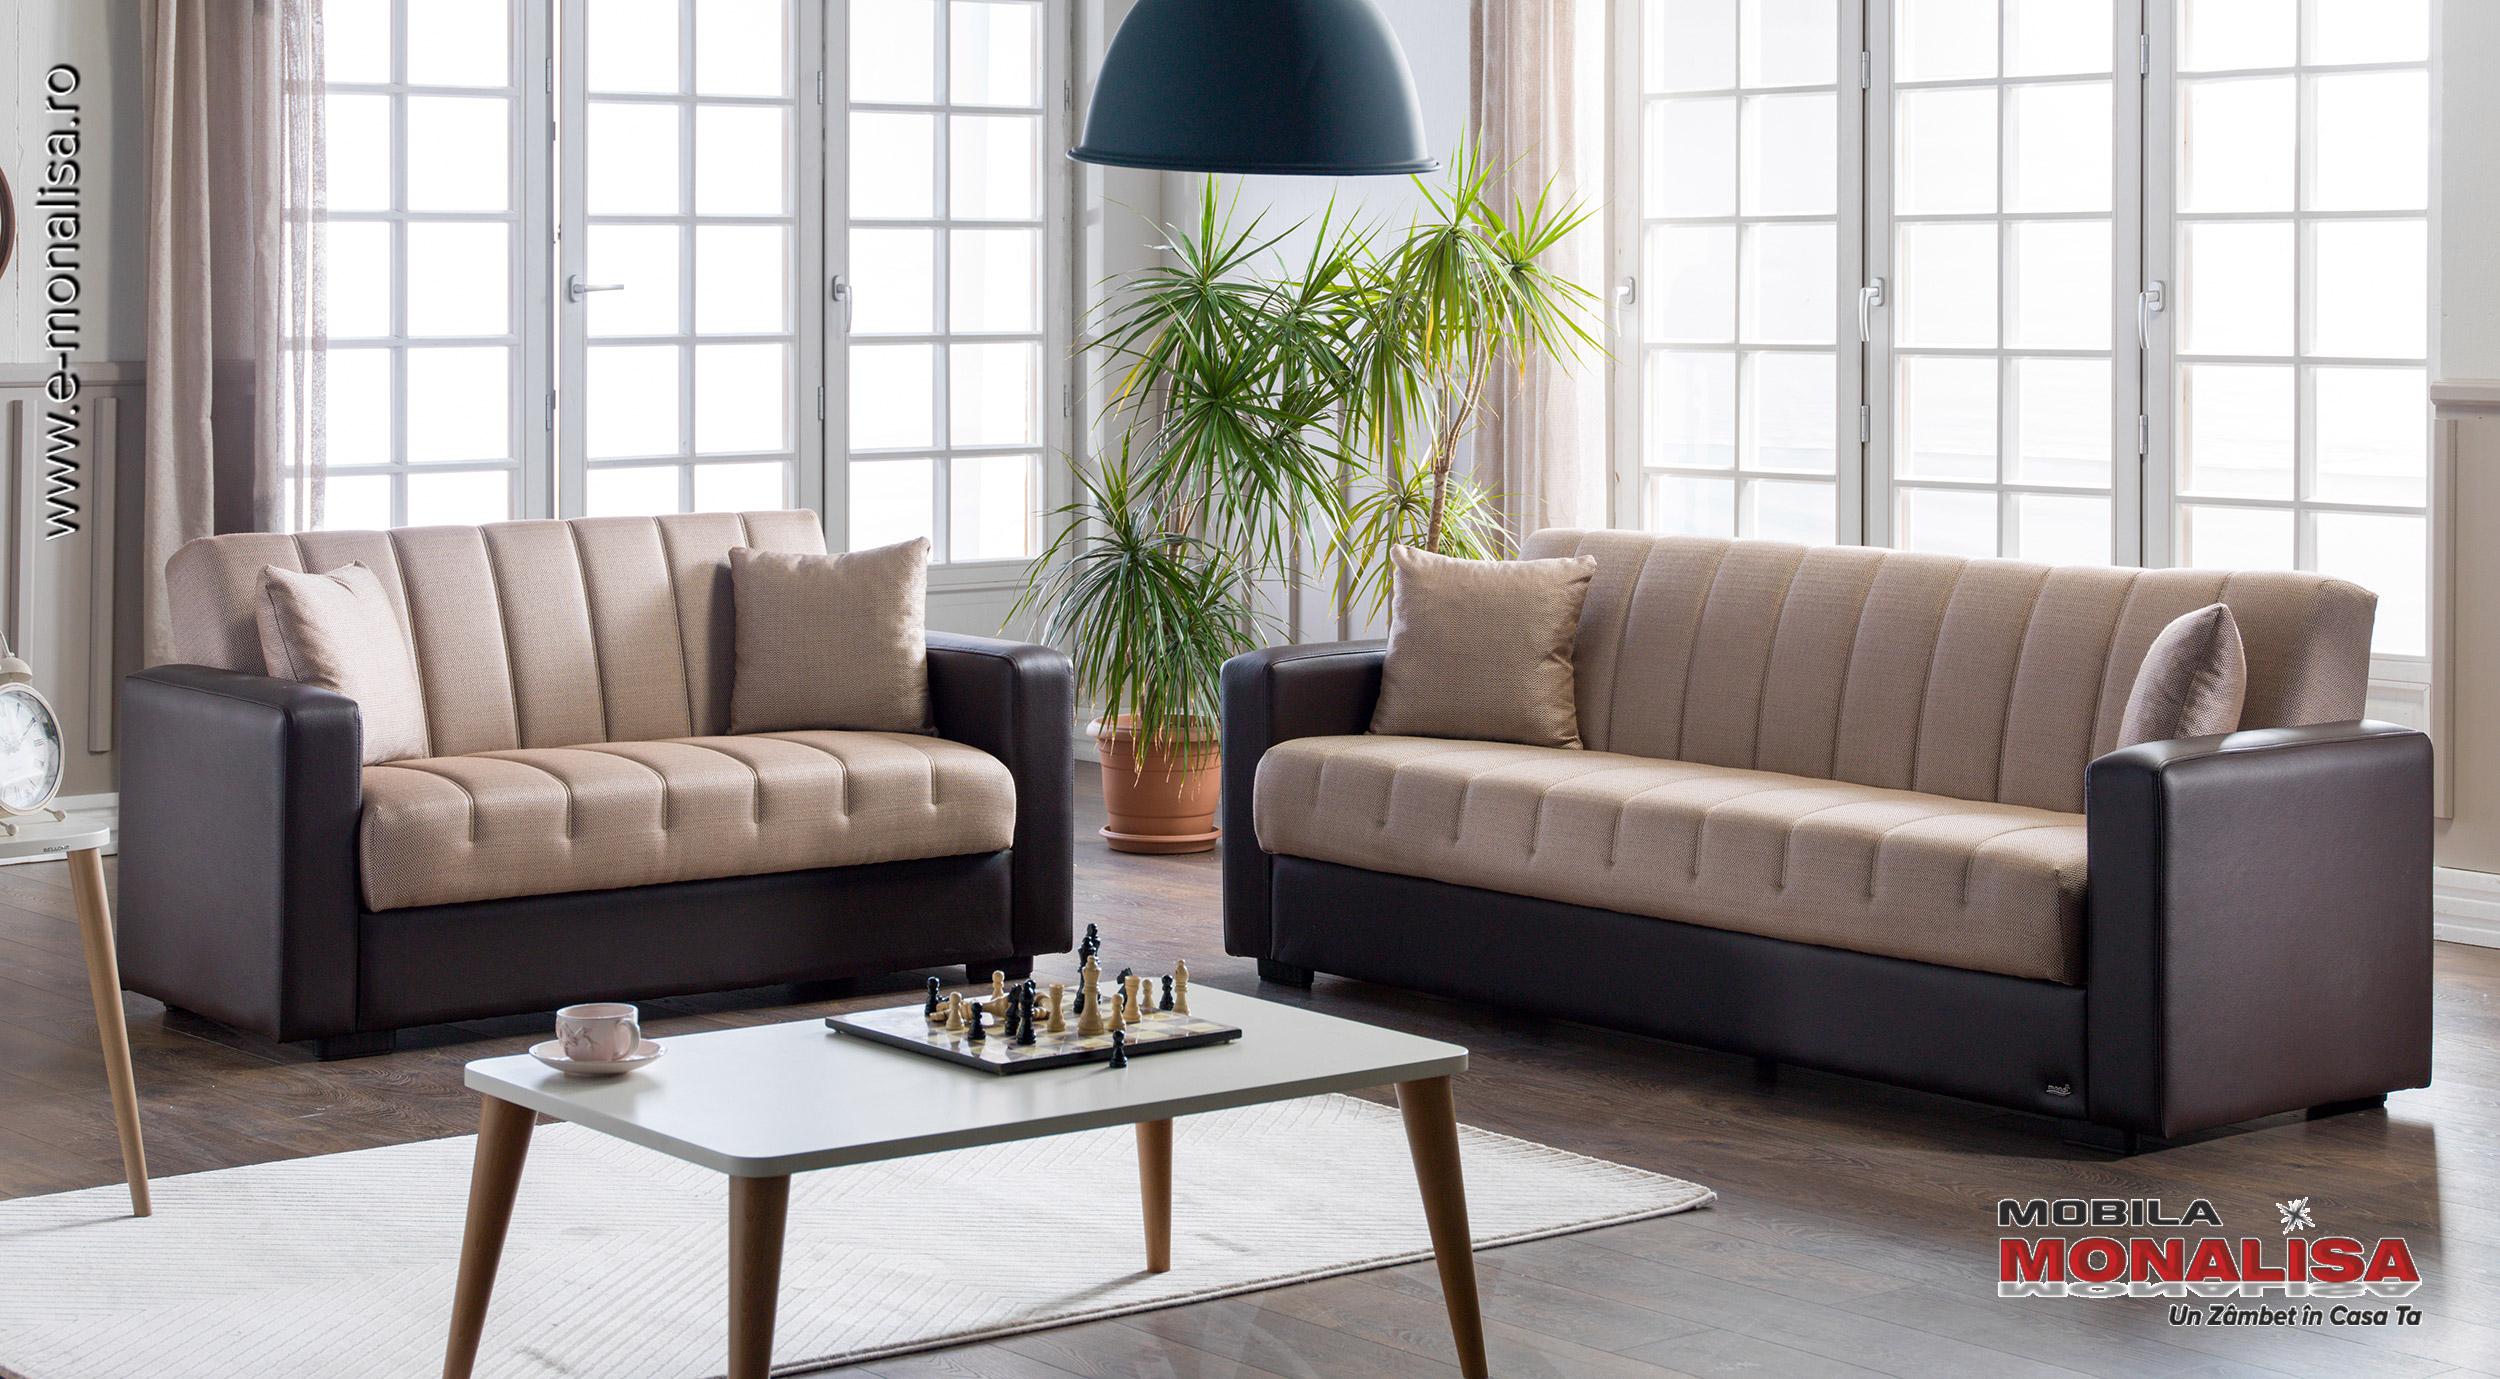 Canapele ieftine extensibile 3 locuri o persoana